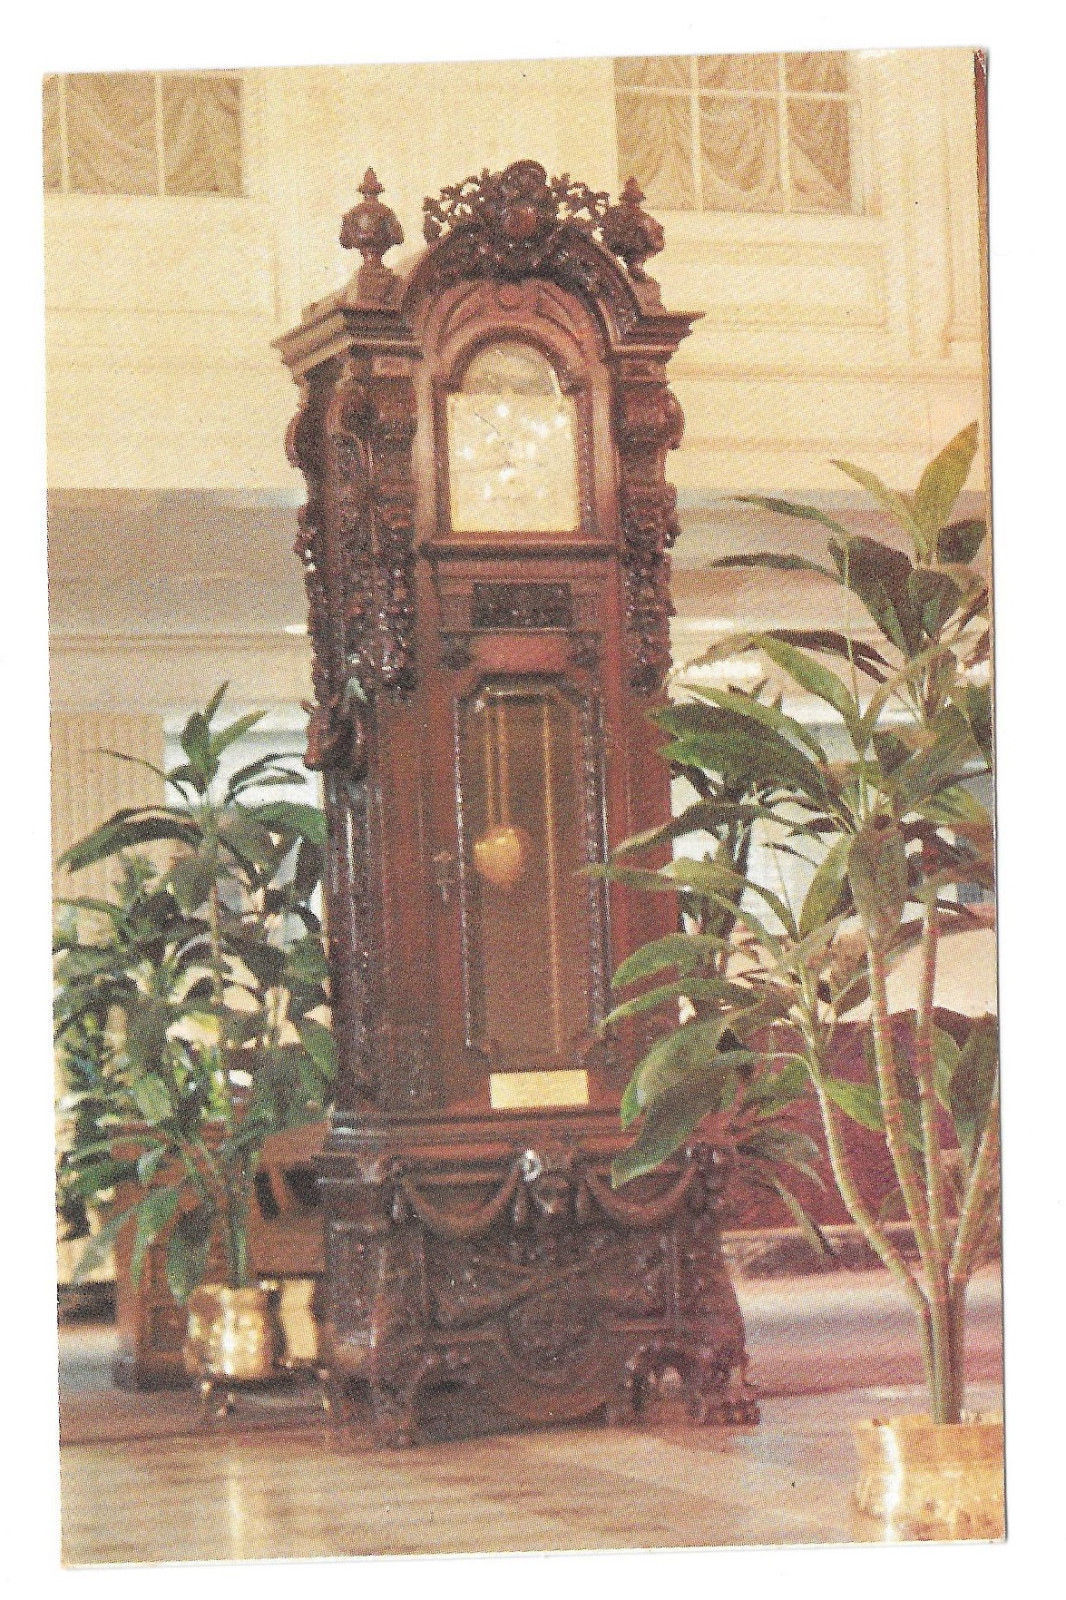 LA New Orleans Hotel Monteleone French Quarter Grandfather Clock Vtg Postcard